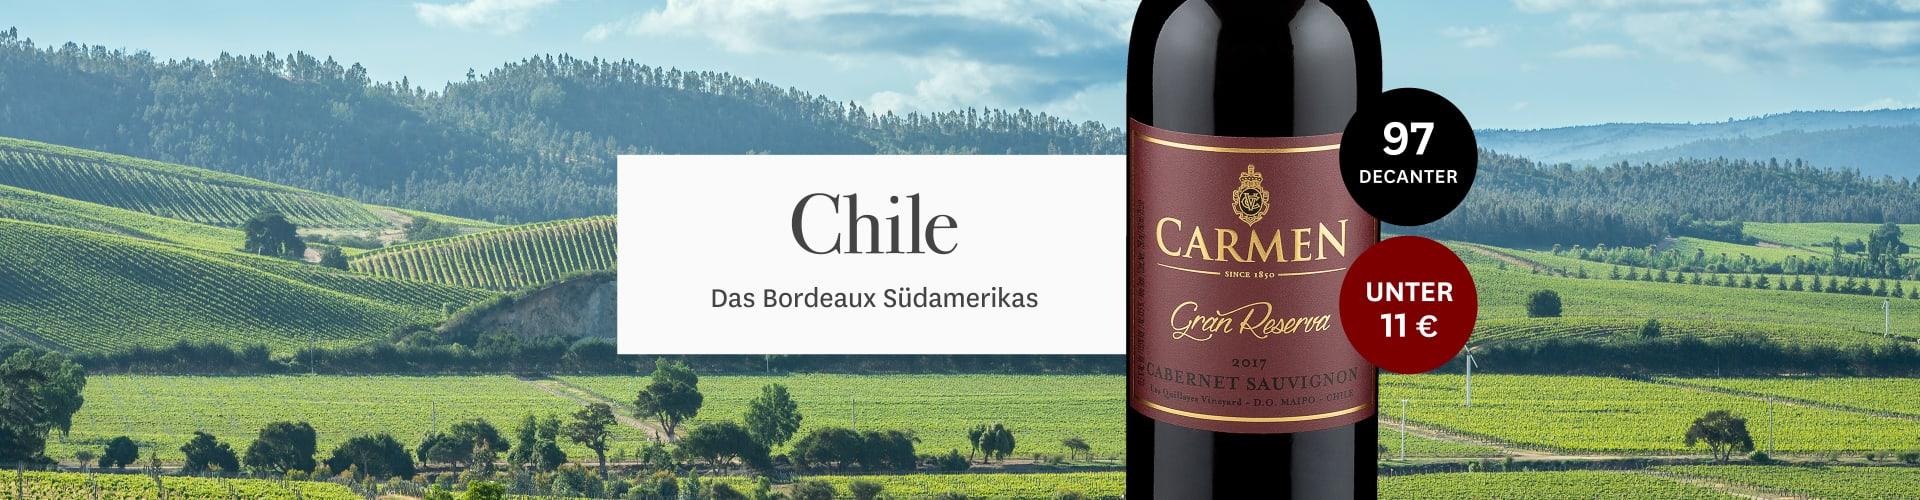 Blockbuster-Gran Reserva aus Chile